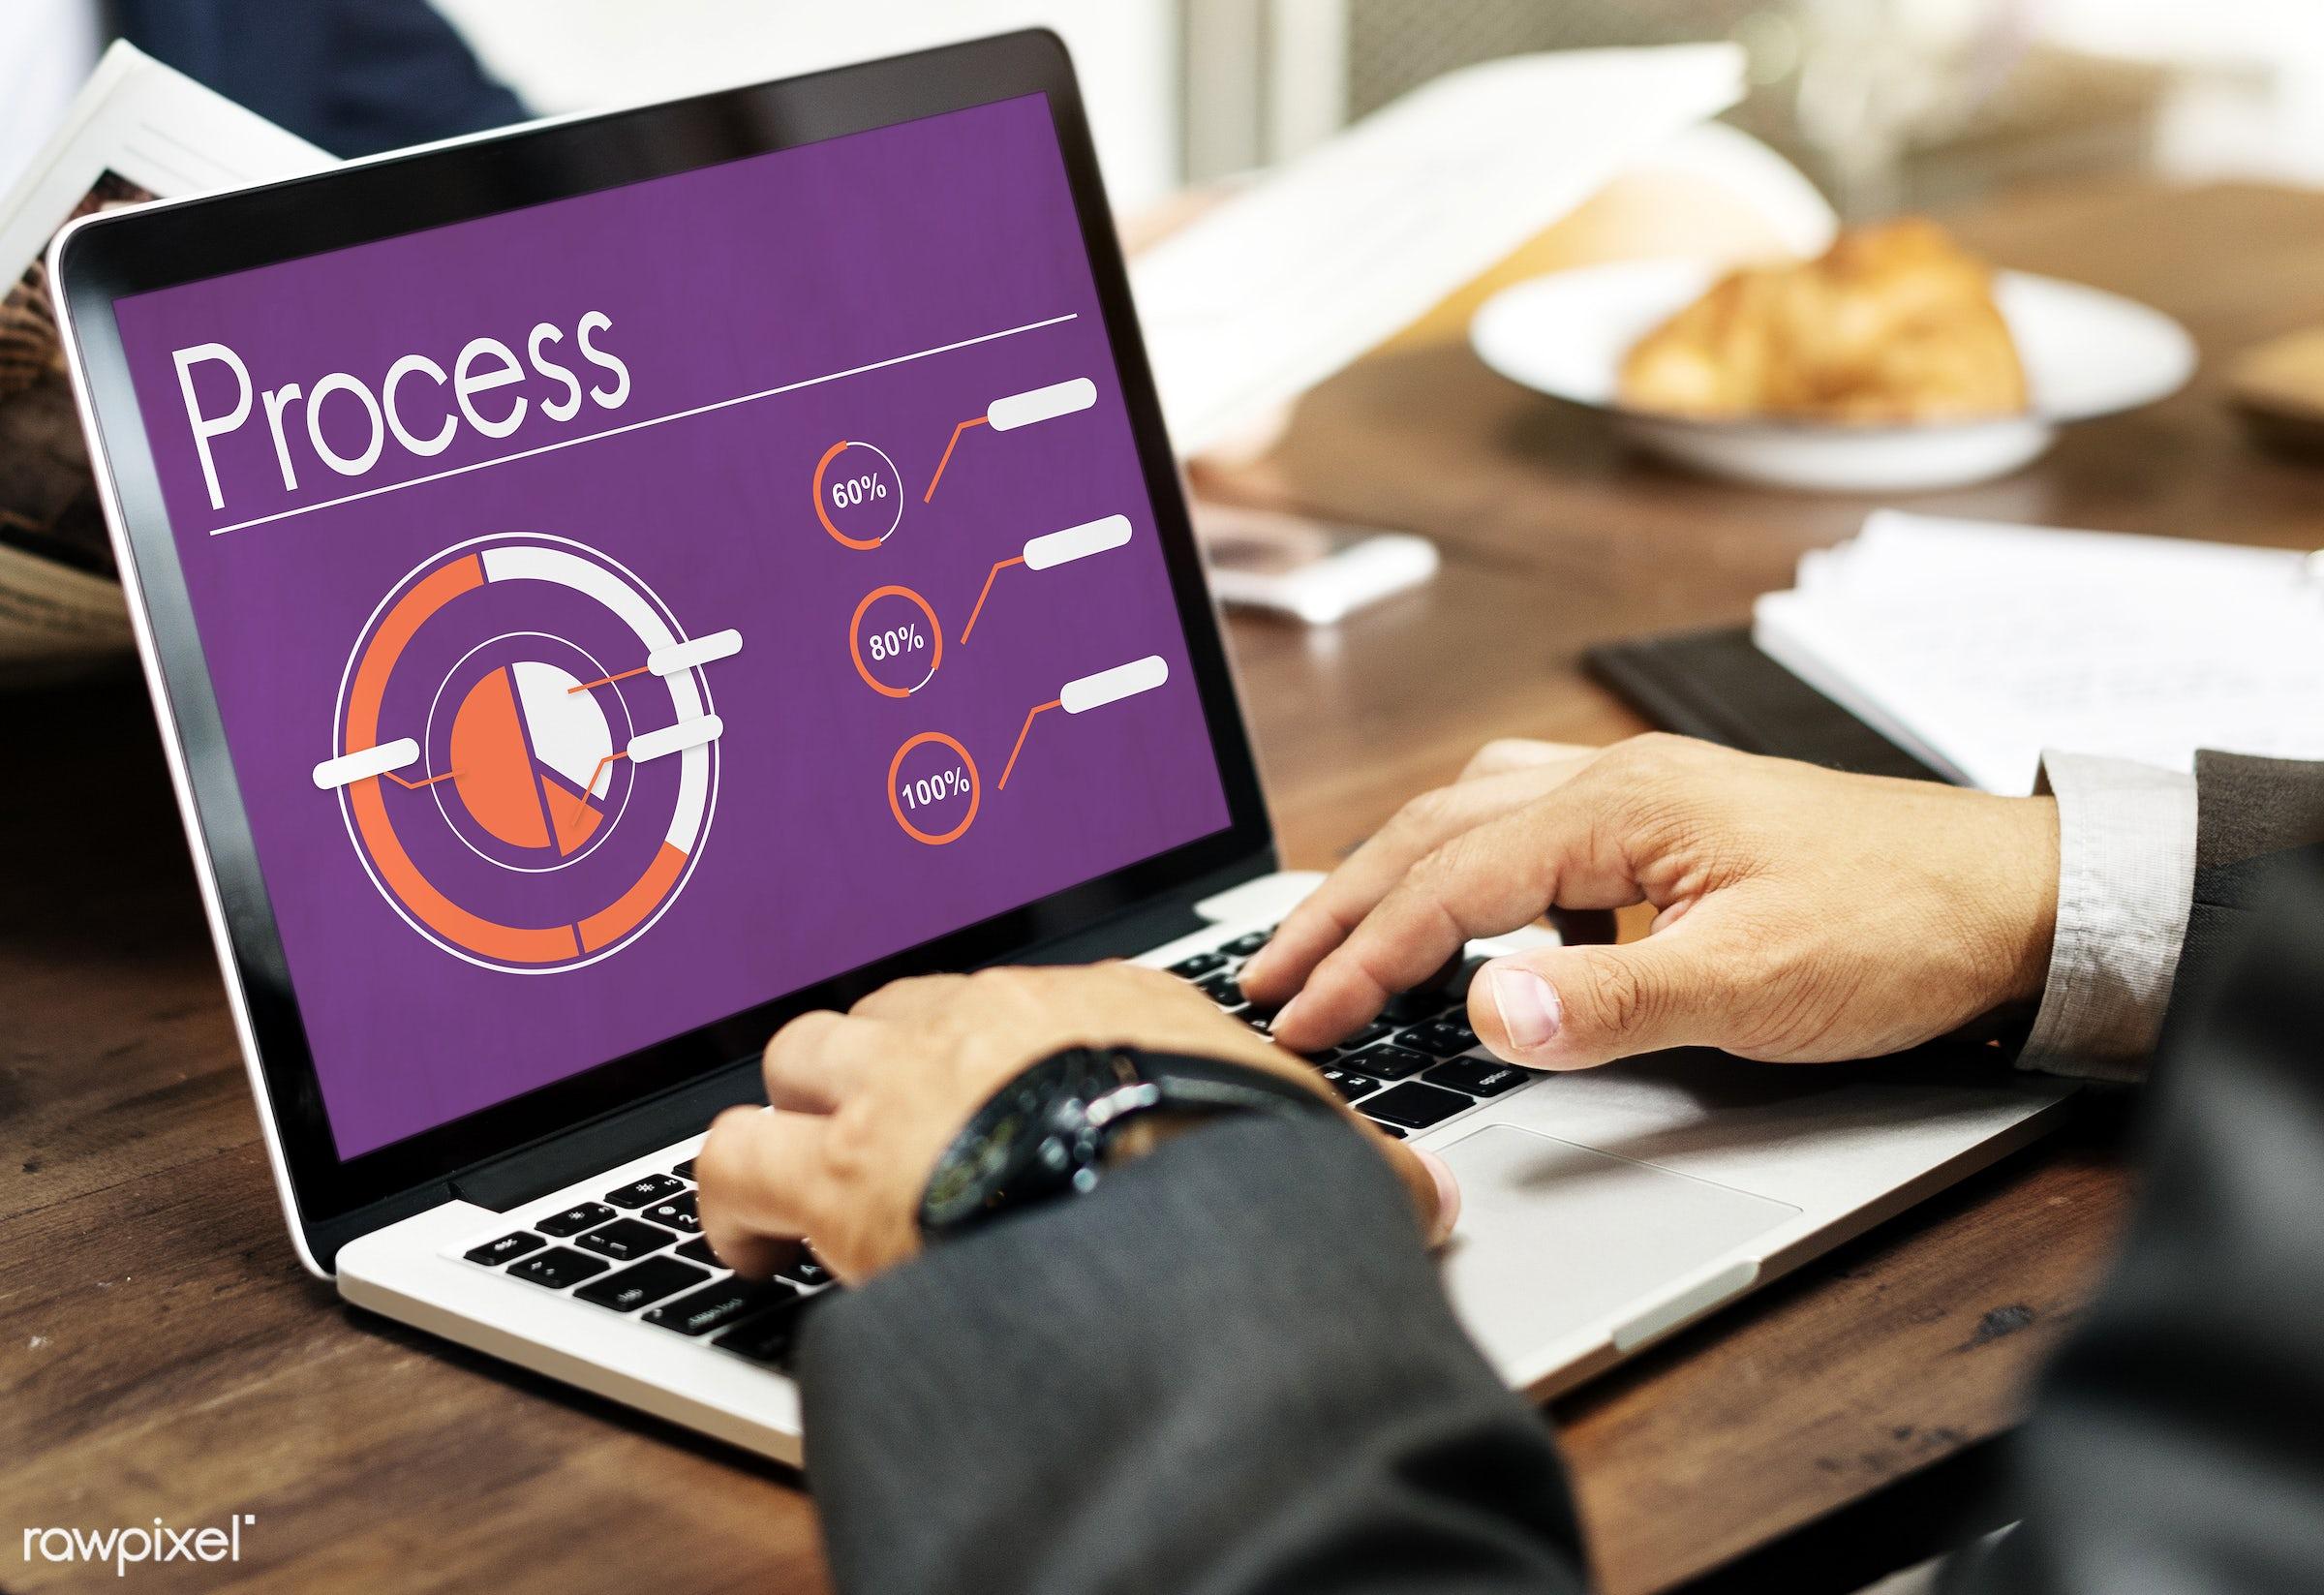 achievement, analysis, browse, business, business plan, businessman, cafe, chart, corporate, development, device, digital...